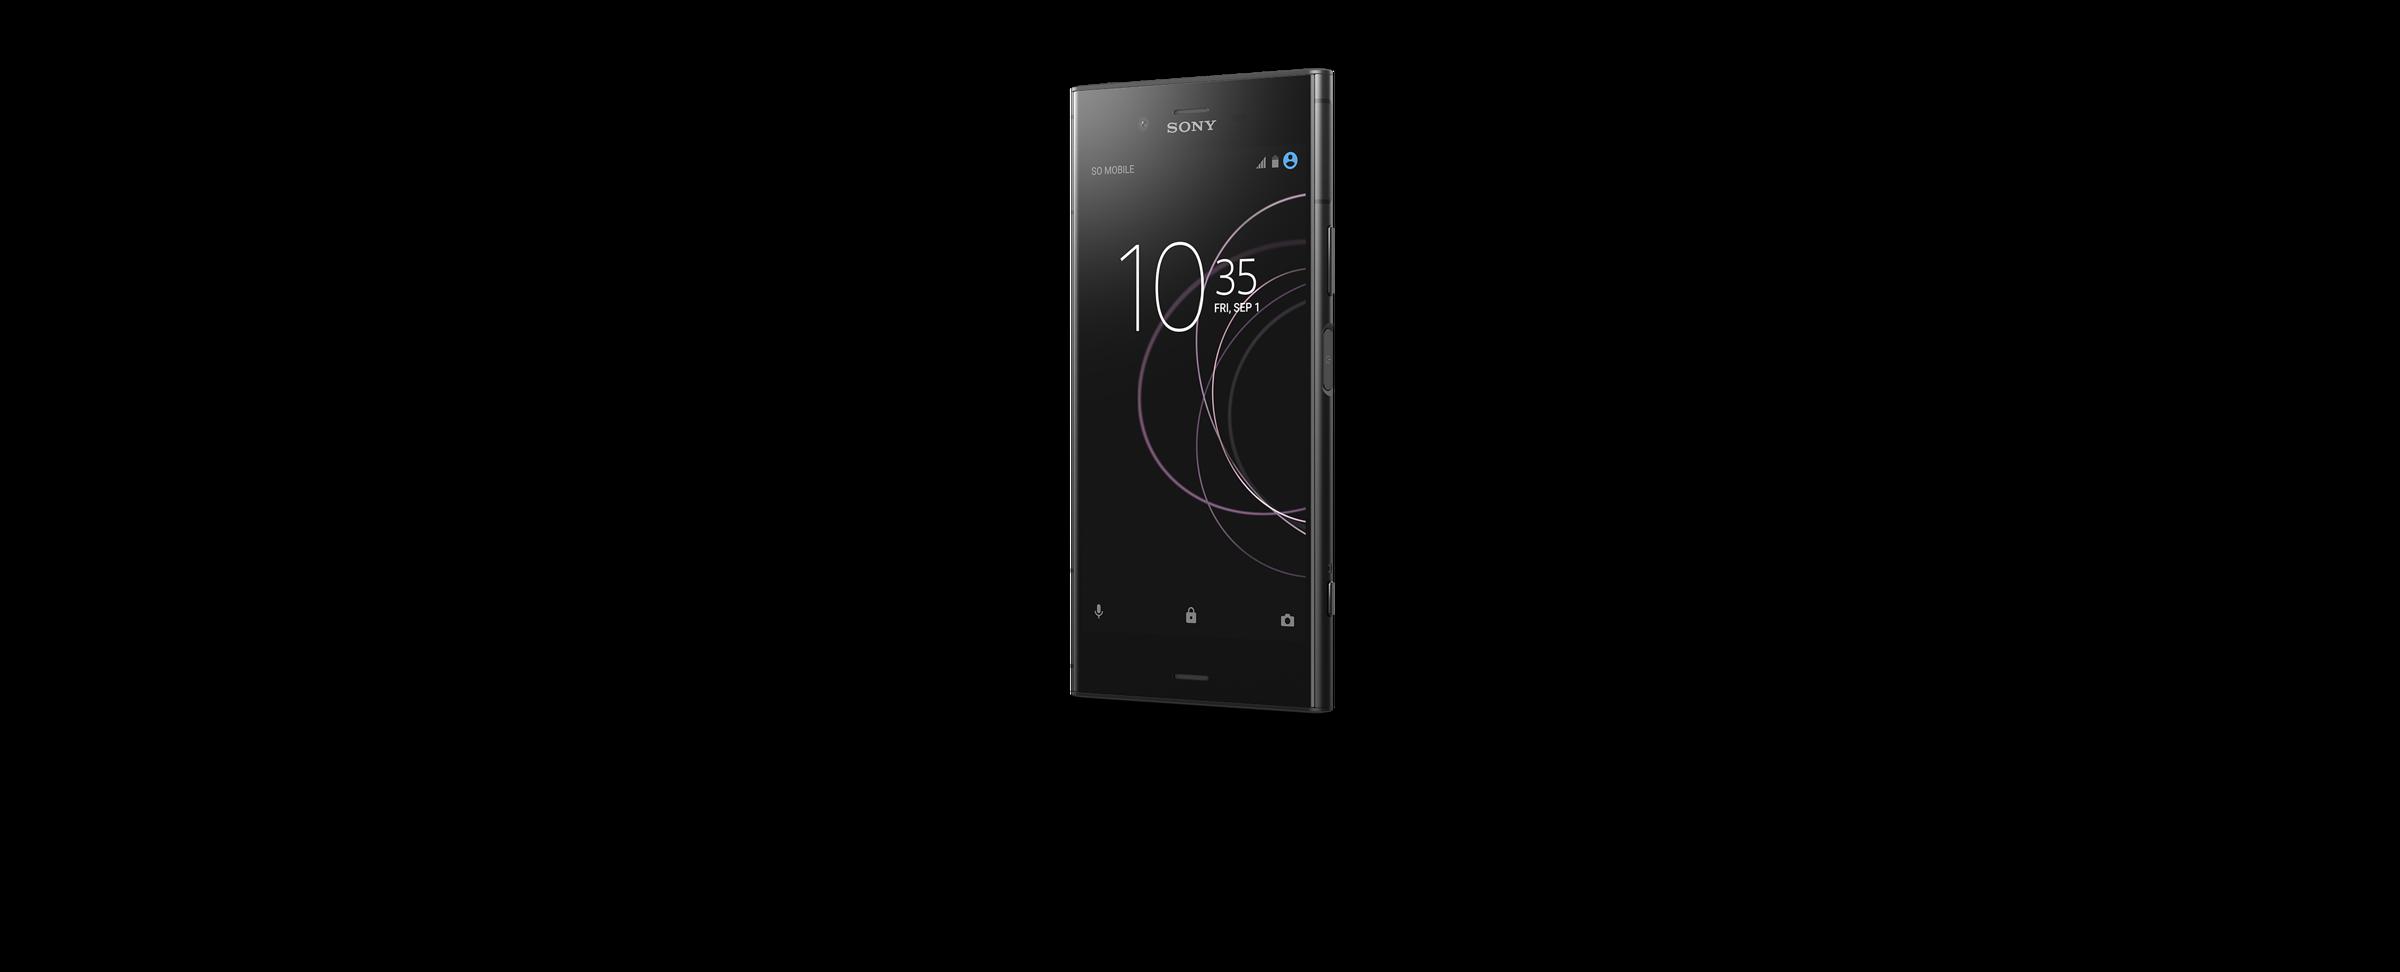 Sony Xperia XZ1 Image